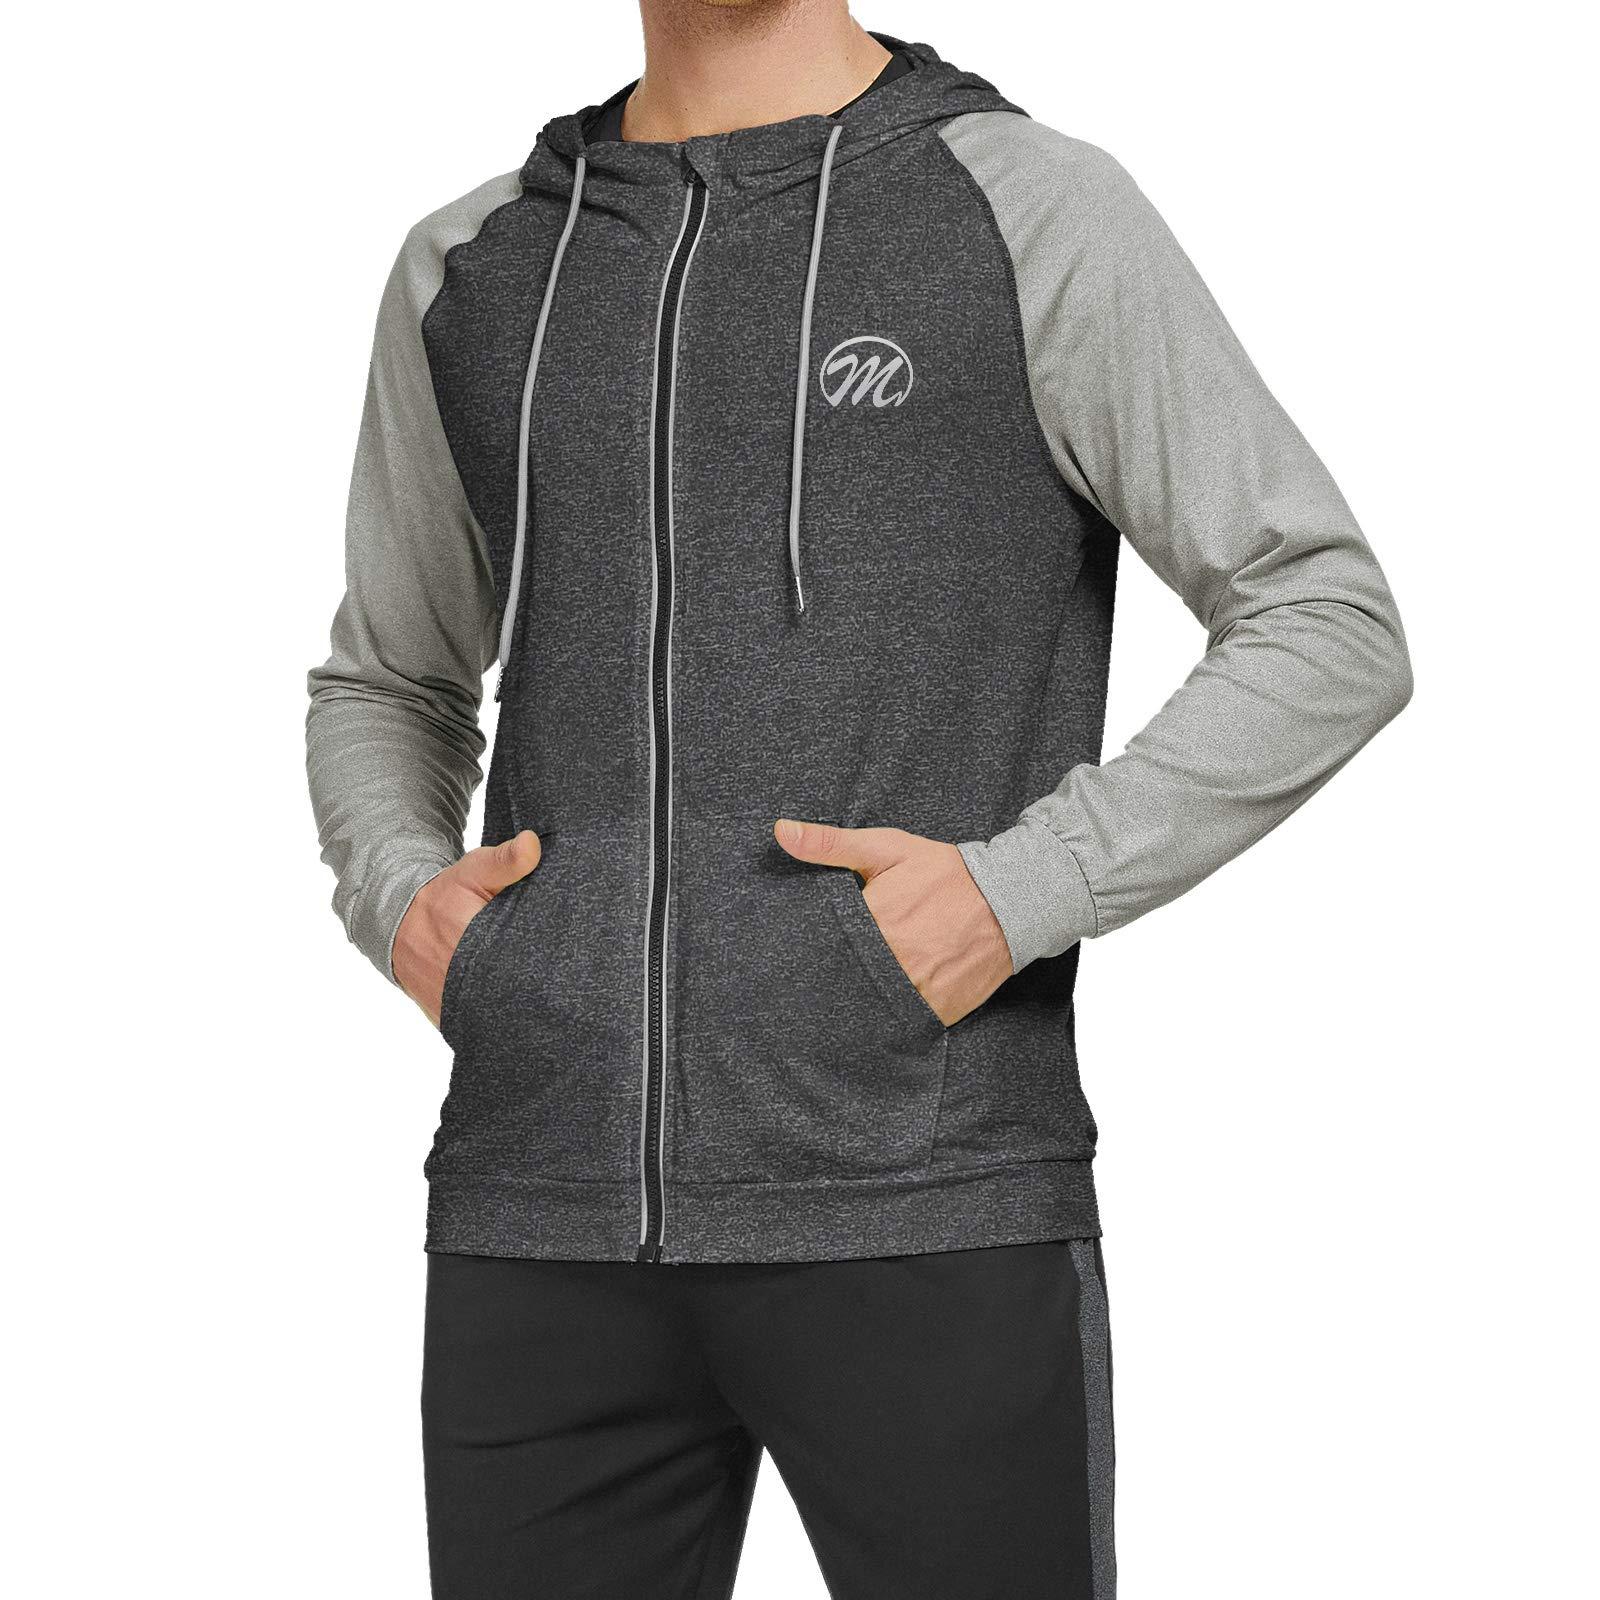 Men's Running Jacket, Full Zip Long Sleeve Sport Shirts Hooded Reflective Top